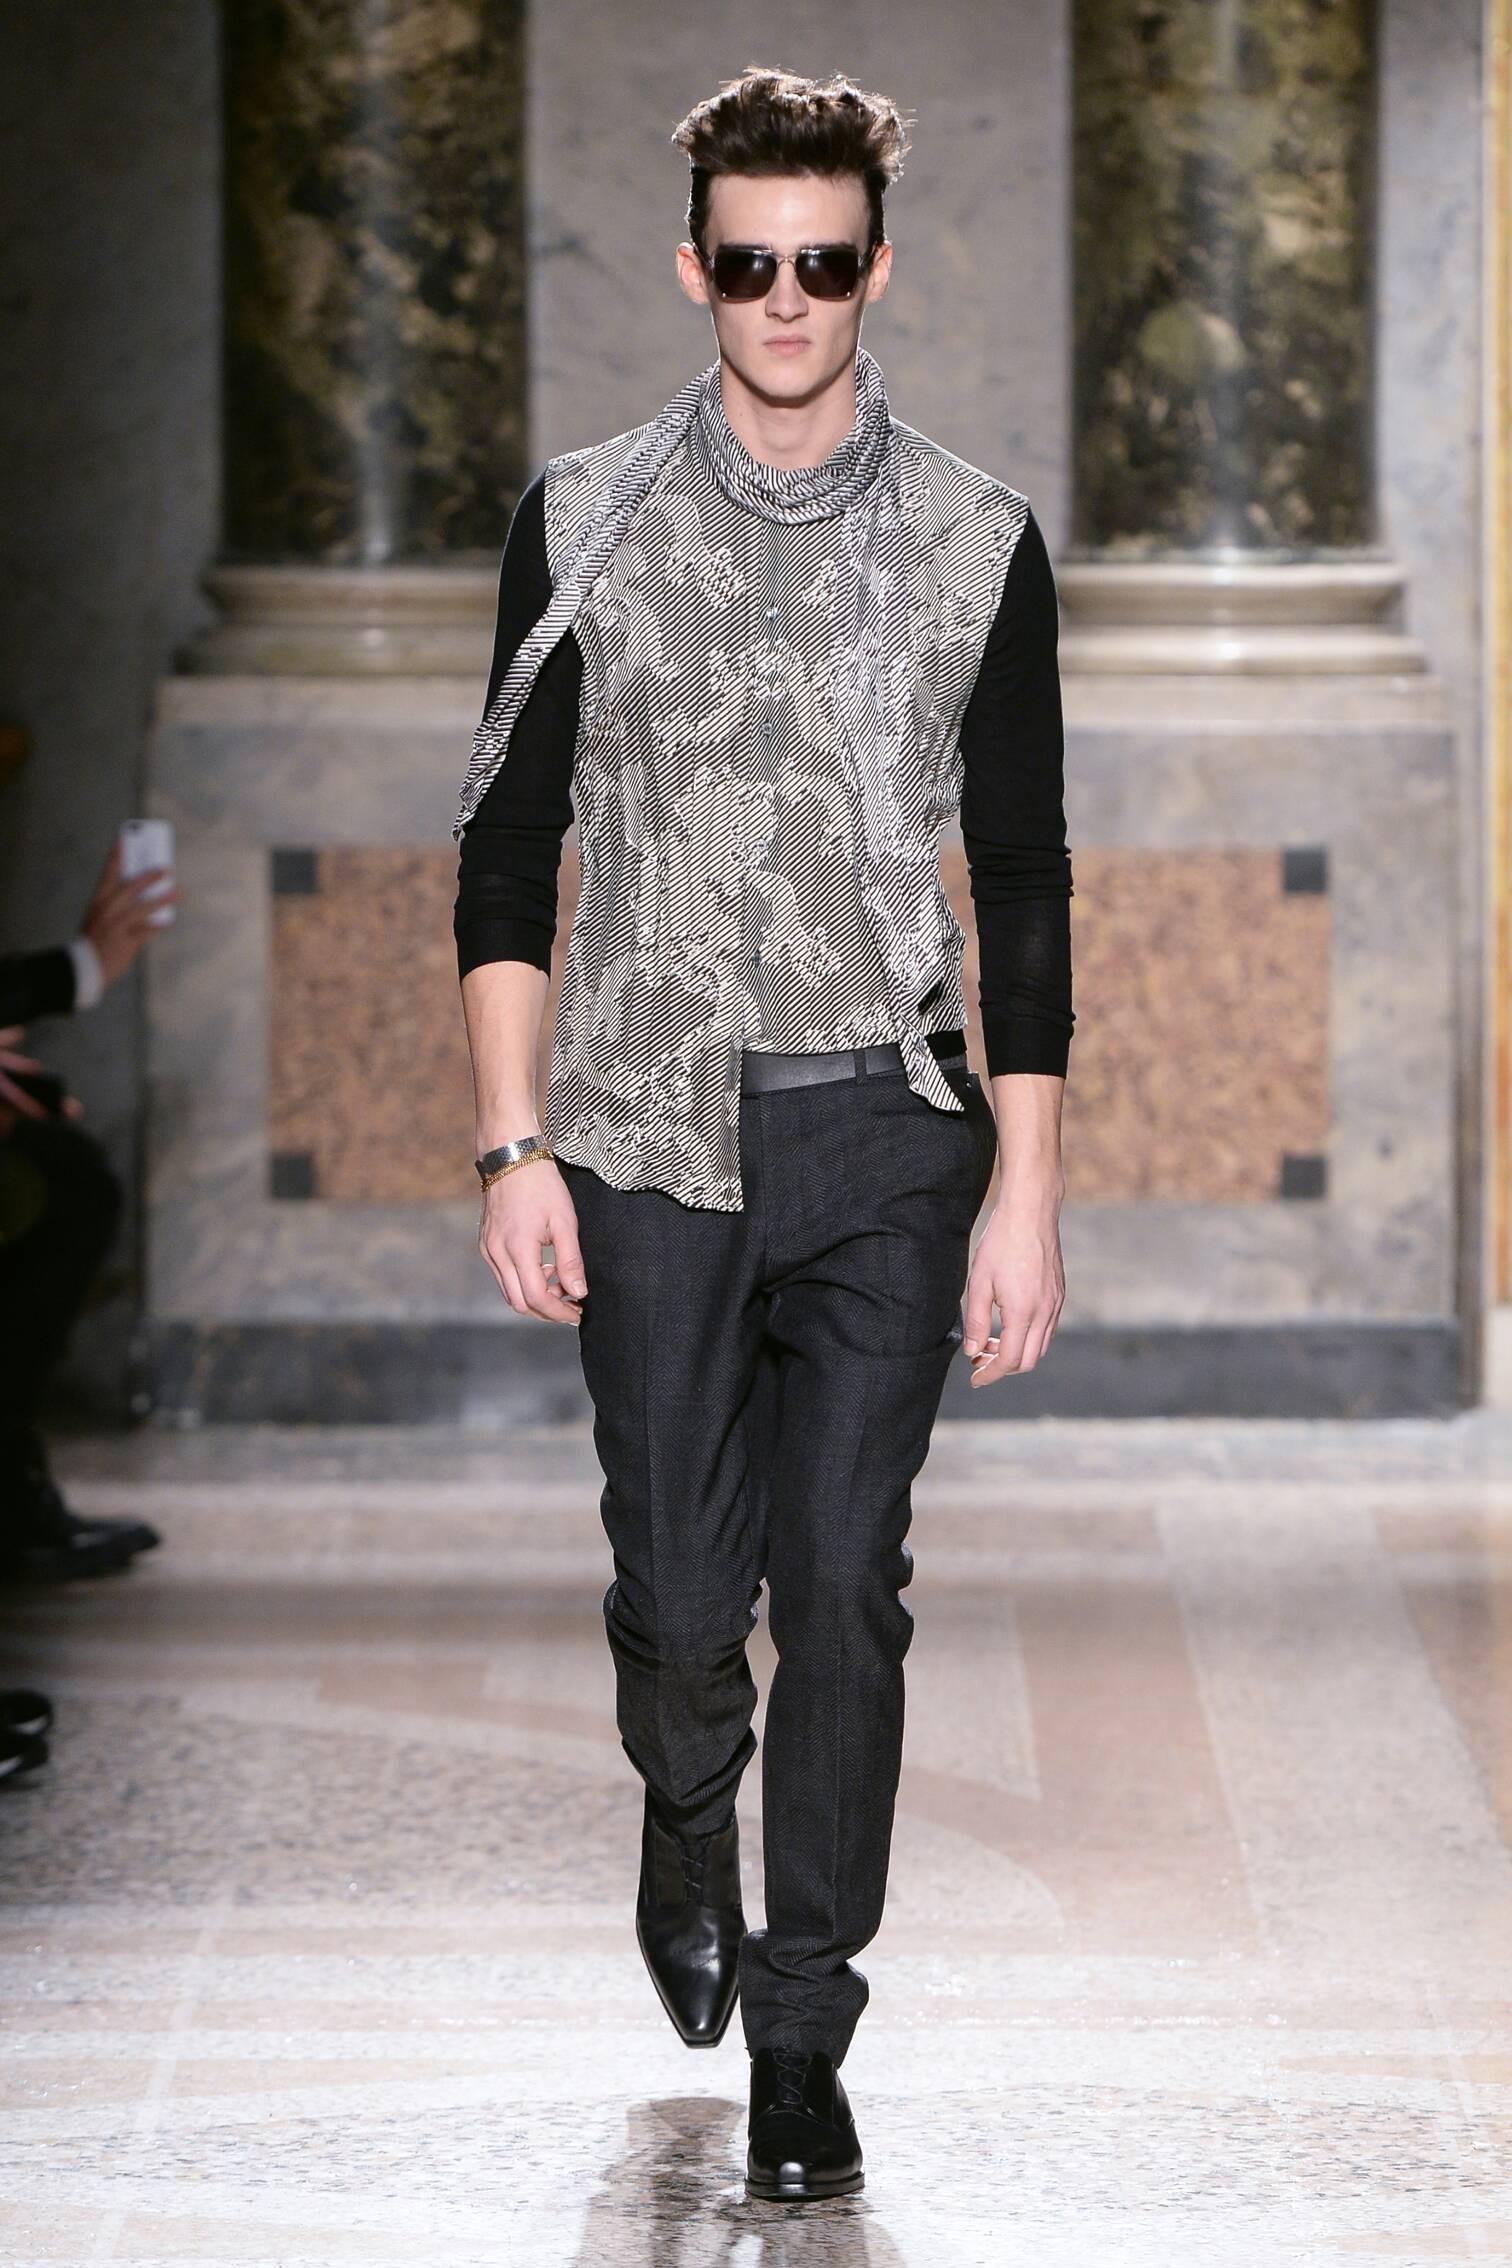 Fashion Model Roberto Cavalli Collection Catwalk